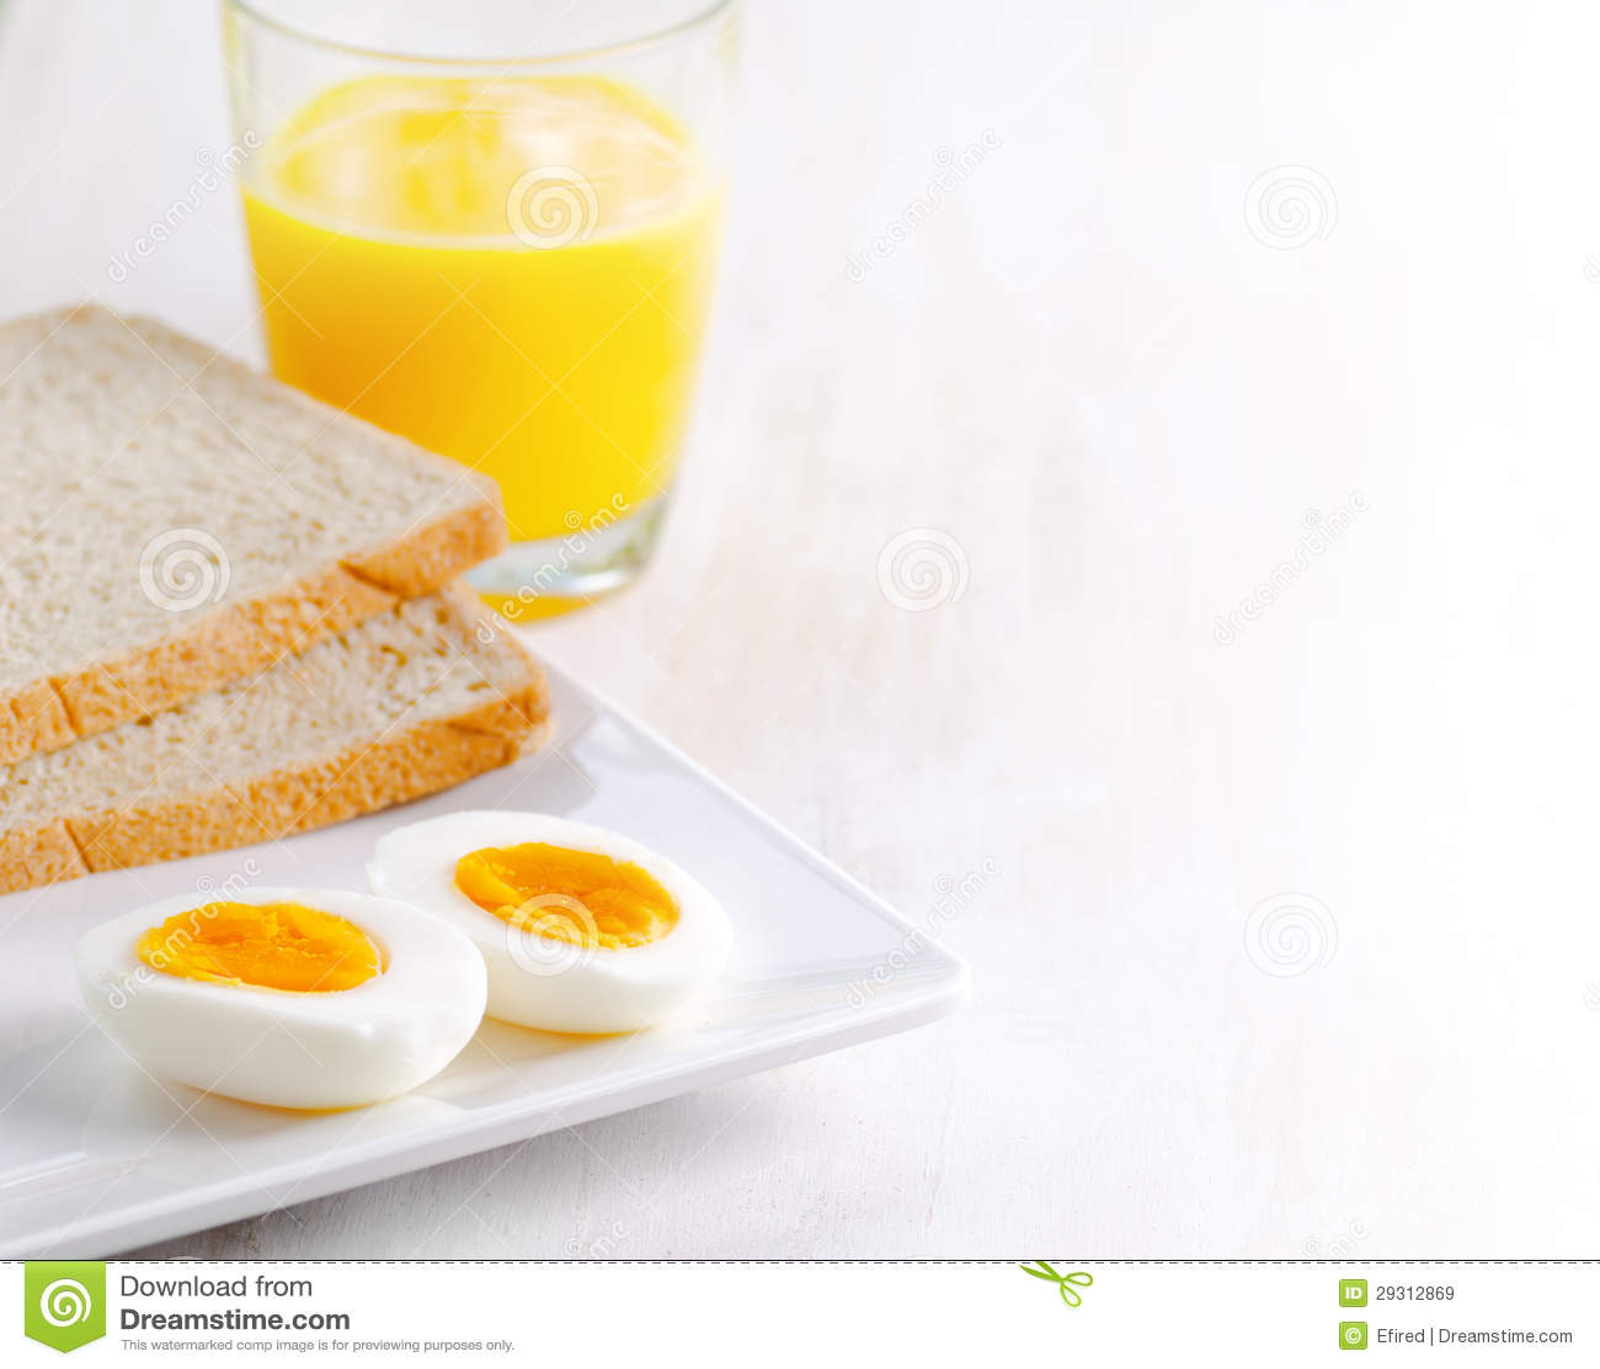 Boiled Egg, Toasts And Orange Juice Royalty Free Stock ...